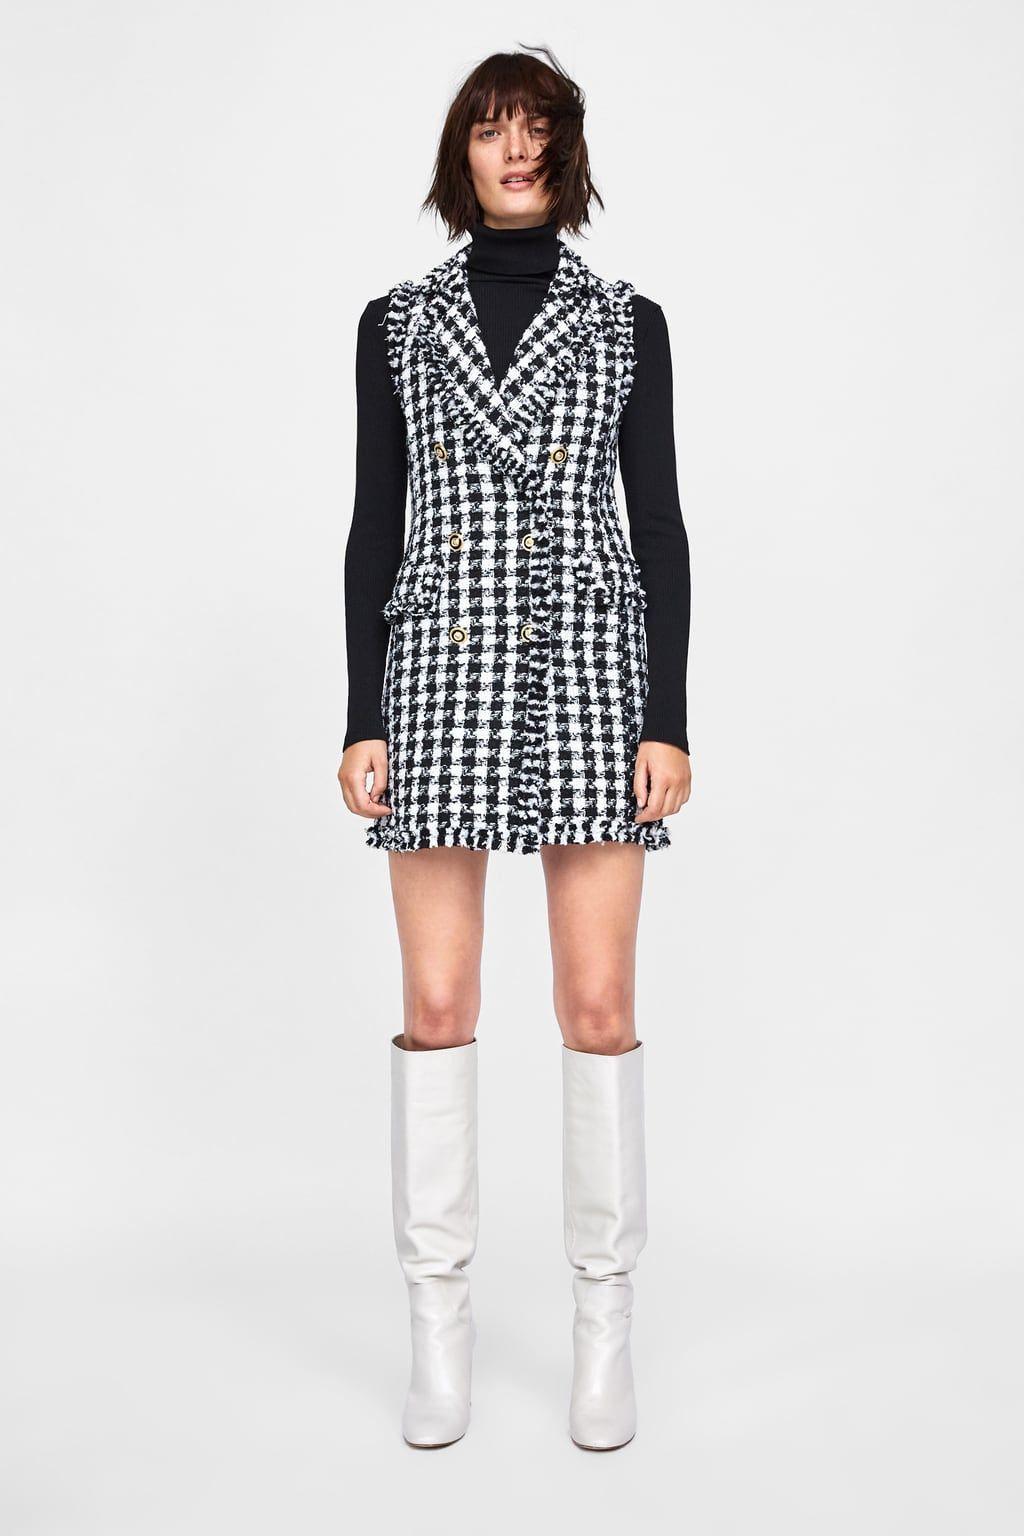 Women's Clothing New 2019 Winter Brand Ladies Wool Tweed Weave Plaid Bow Tassel Dress Women Sweet Pearl Pocket Half Sleeve Mini A Line Dress Wide Selection;